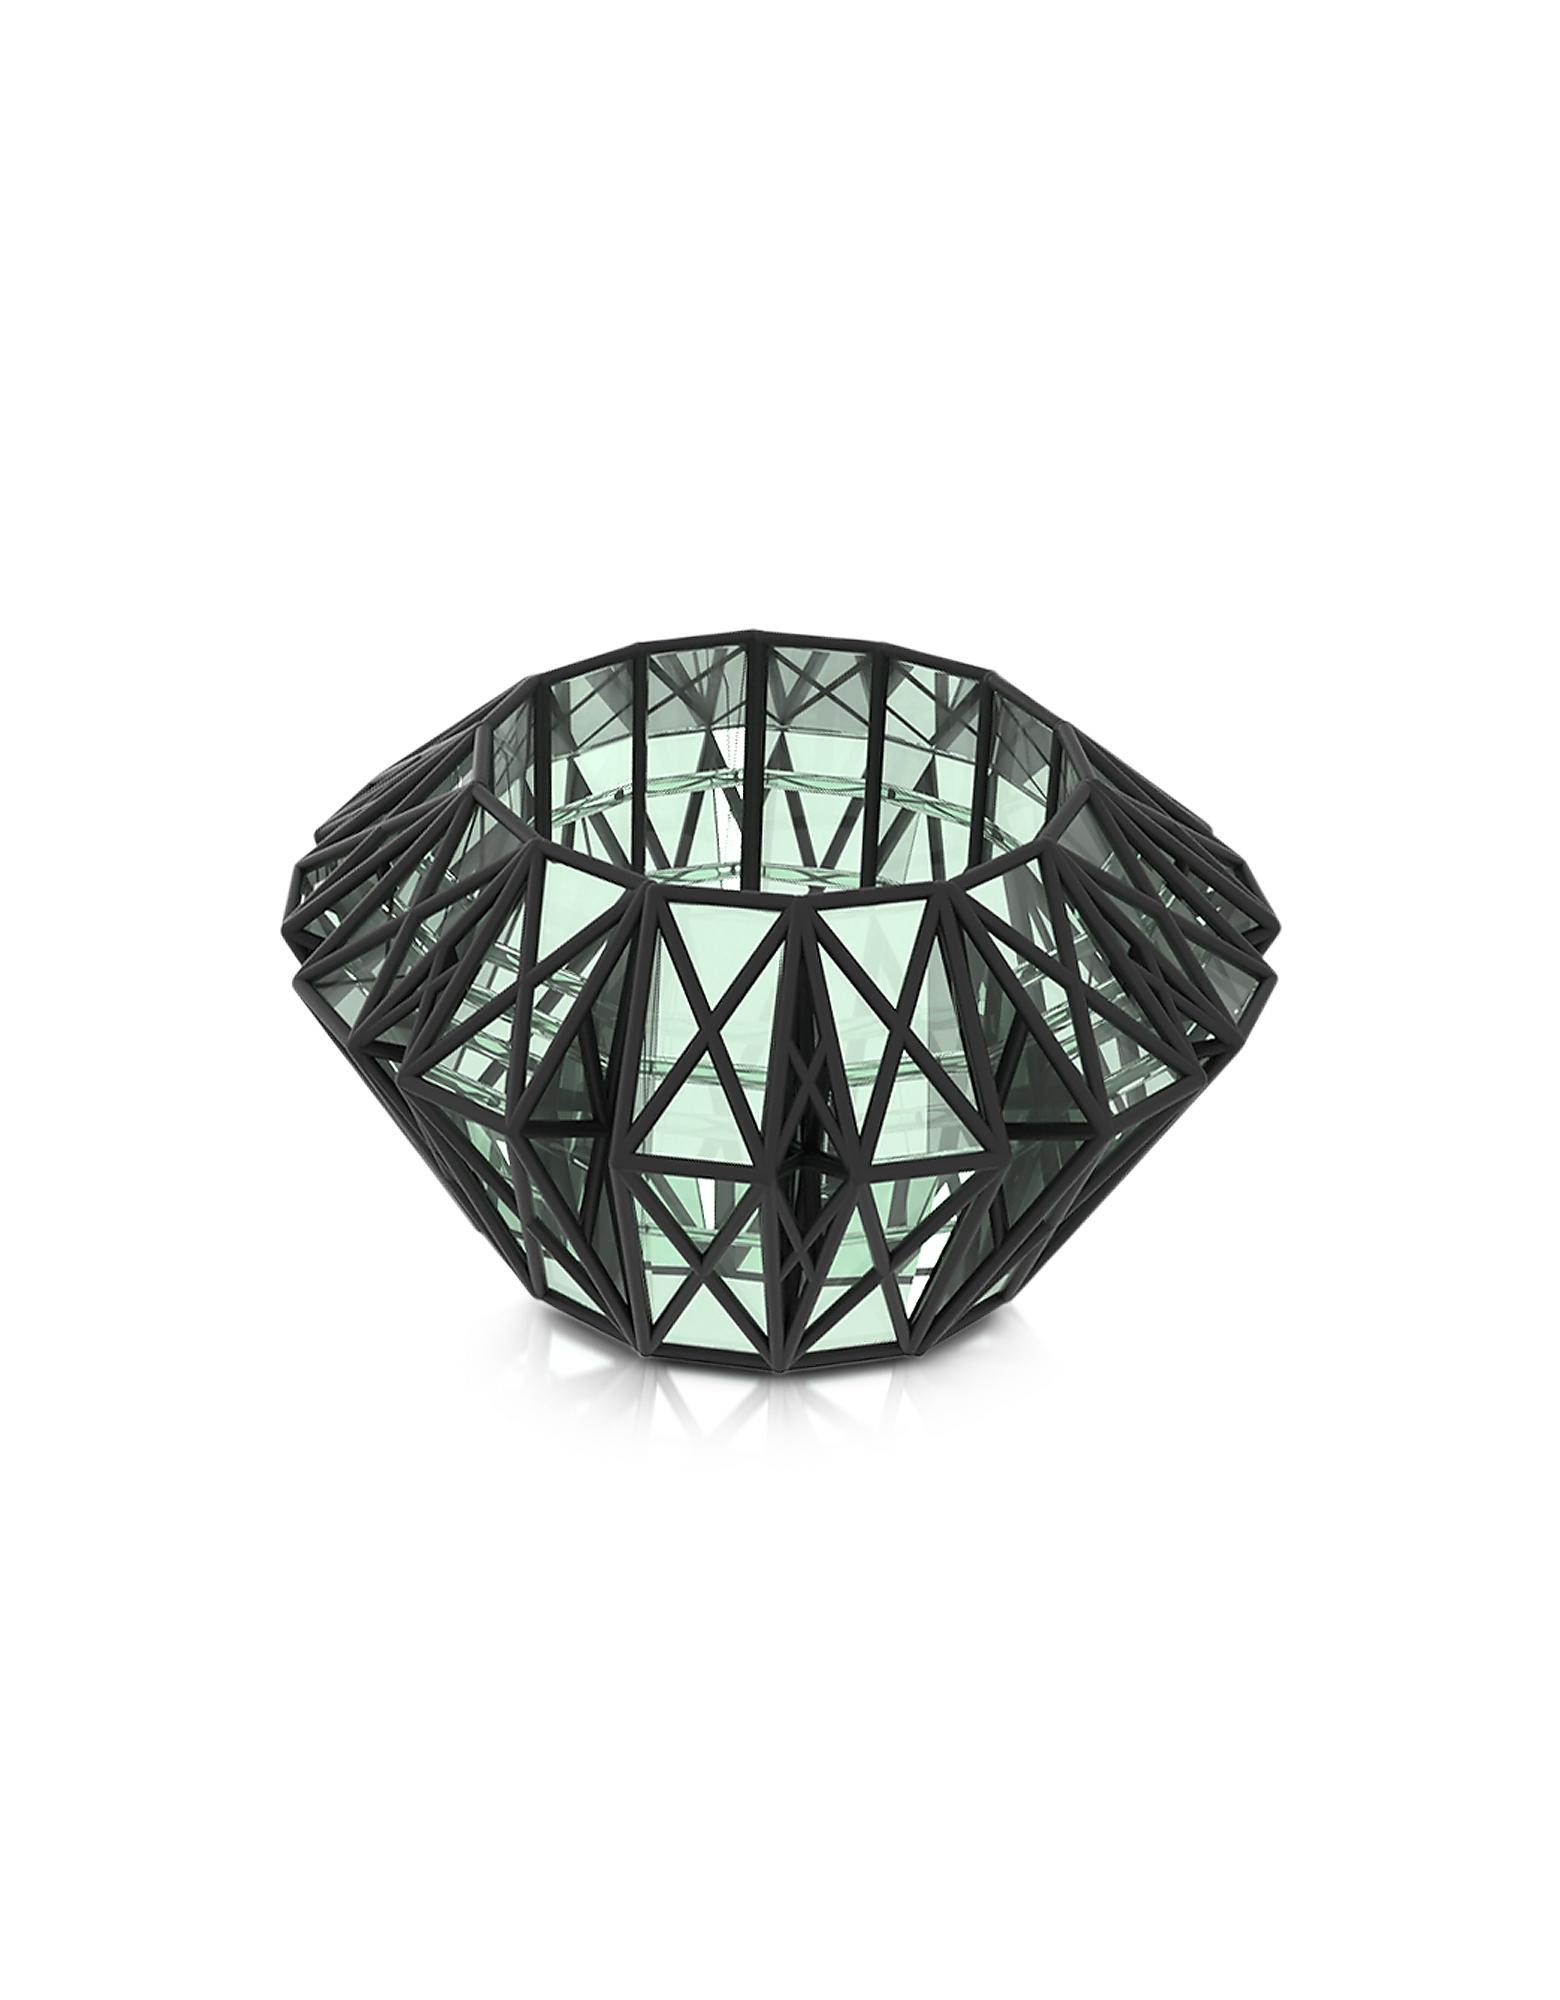 Vojd Studios Bracelets, Translucent Glass Cage Cuff